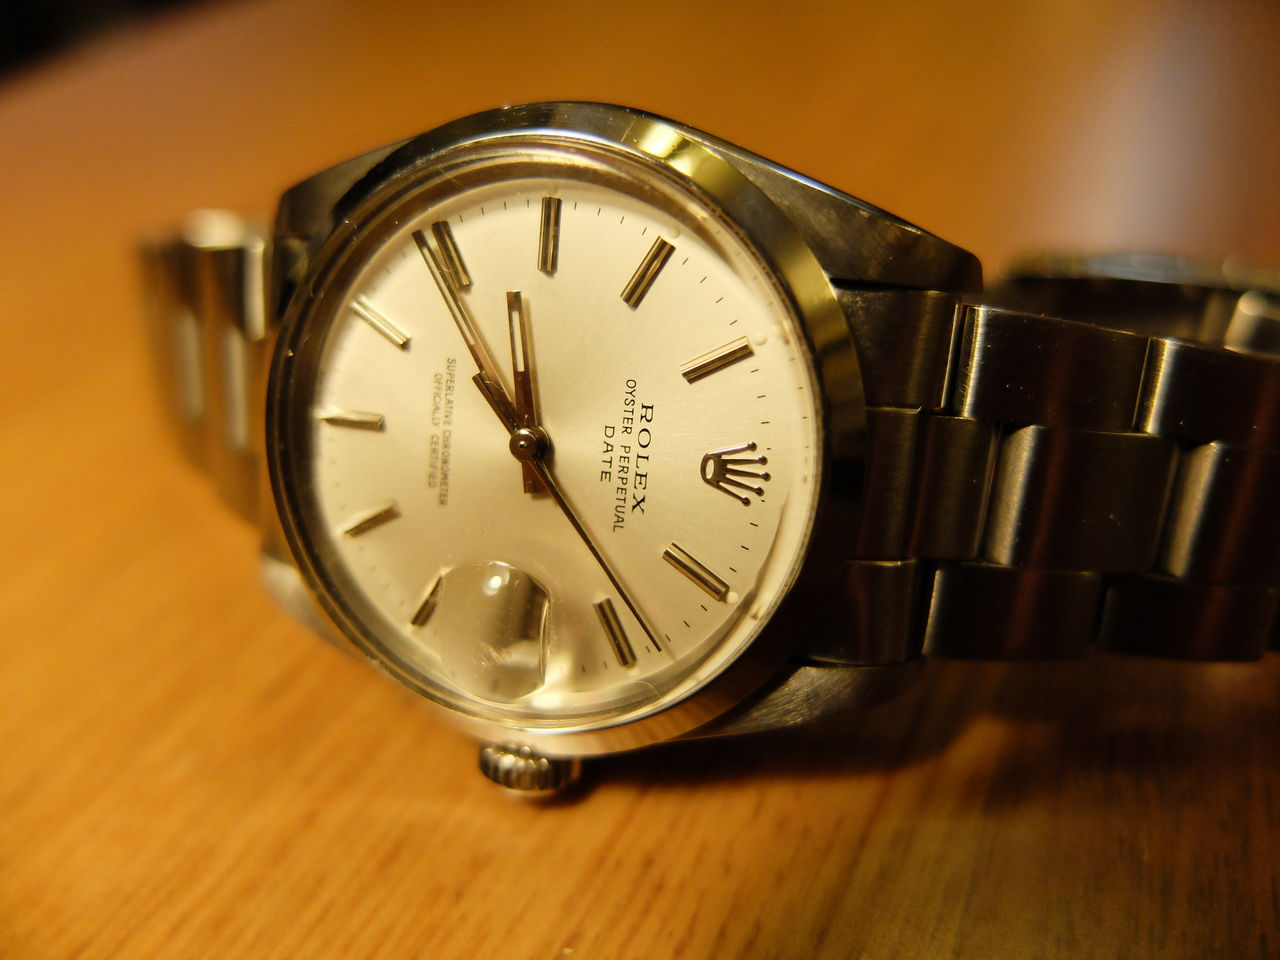 newest bb631 d6819 美の時計たち〜腕時計備忘録 : 【ロレックス】オイスター ...